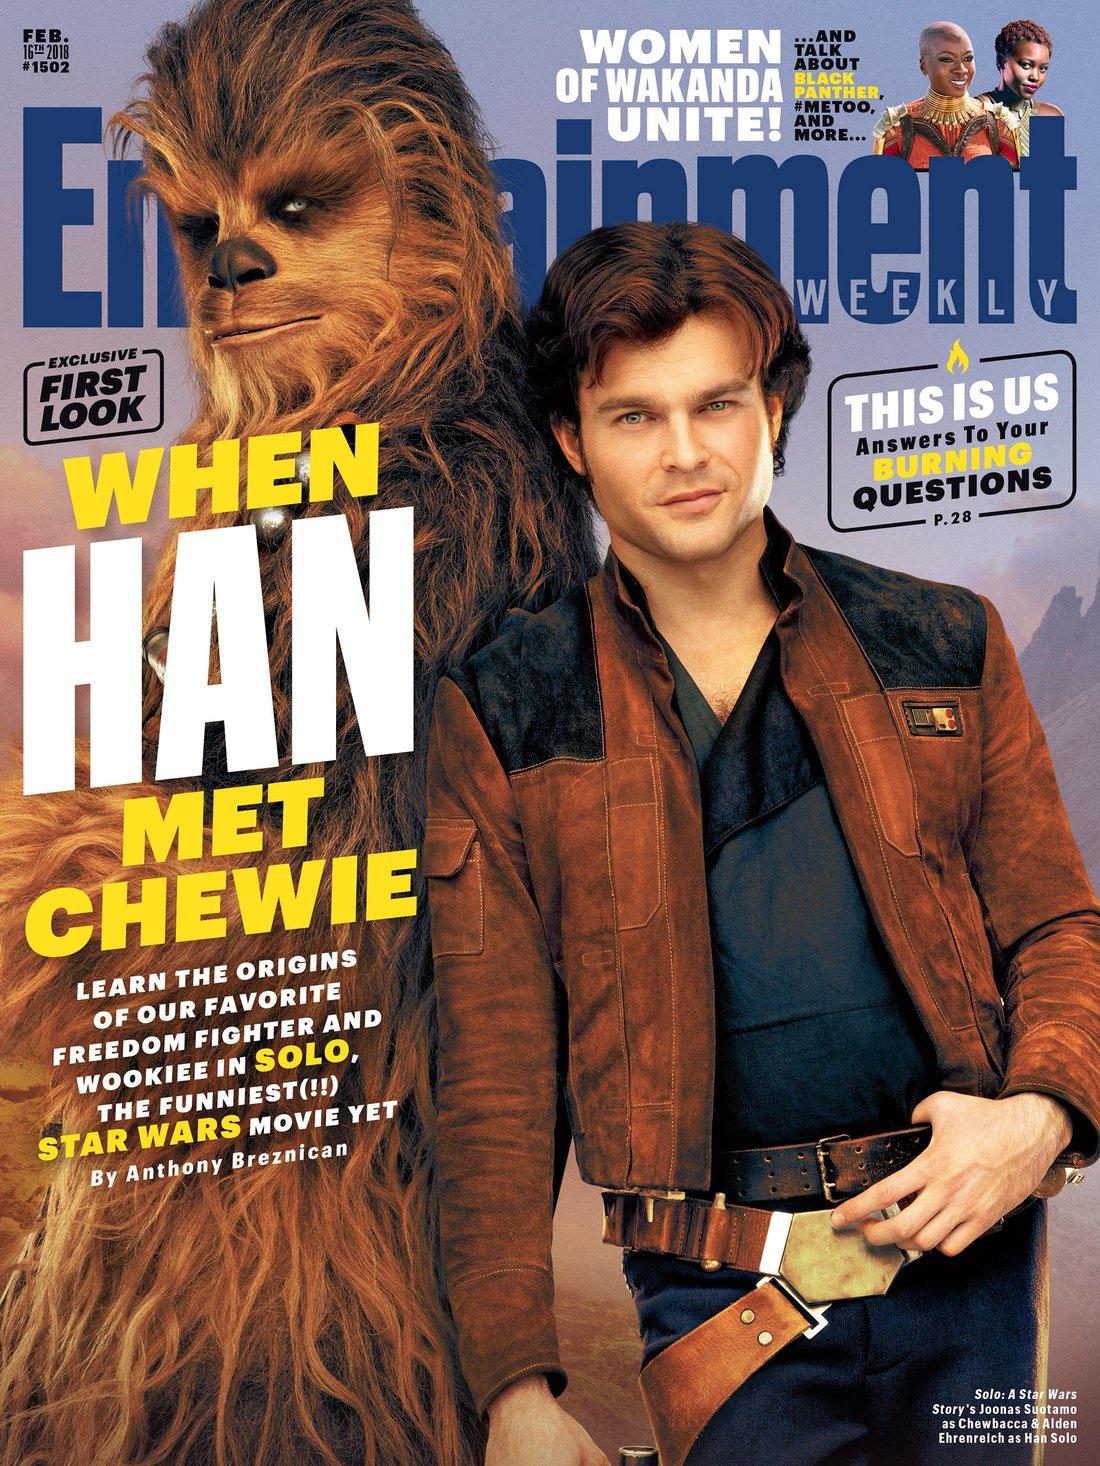 SOLO Star Wars Entertainmenet Weekly